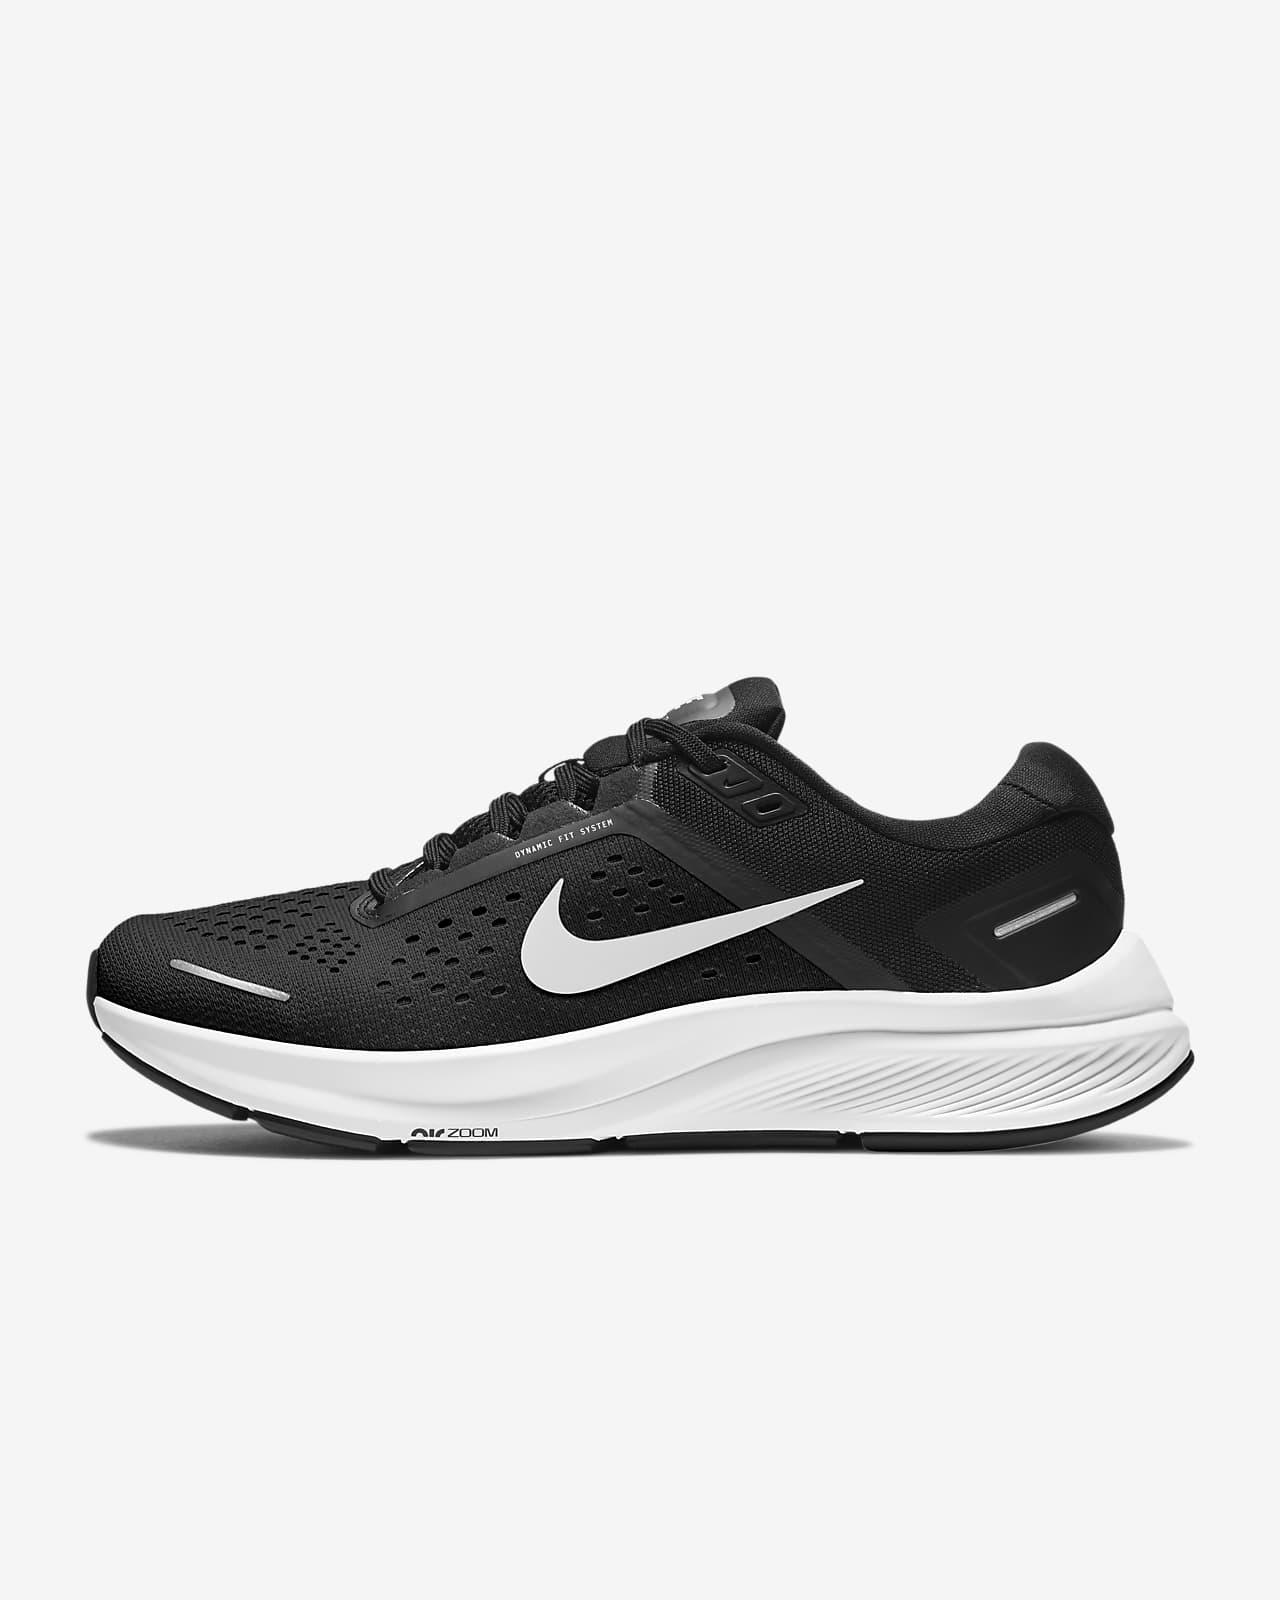 Женские беговые кроссовки Nike Air Zoom Structure 23